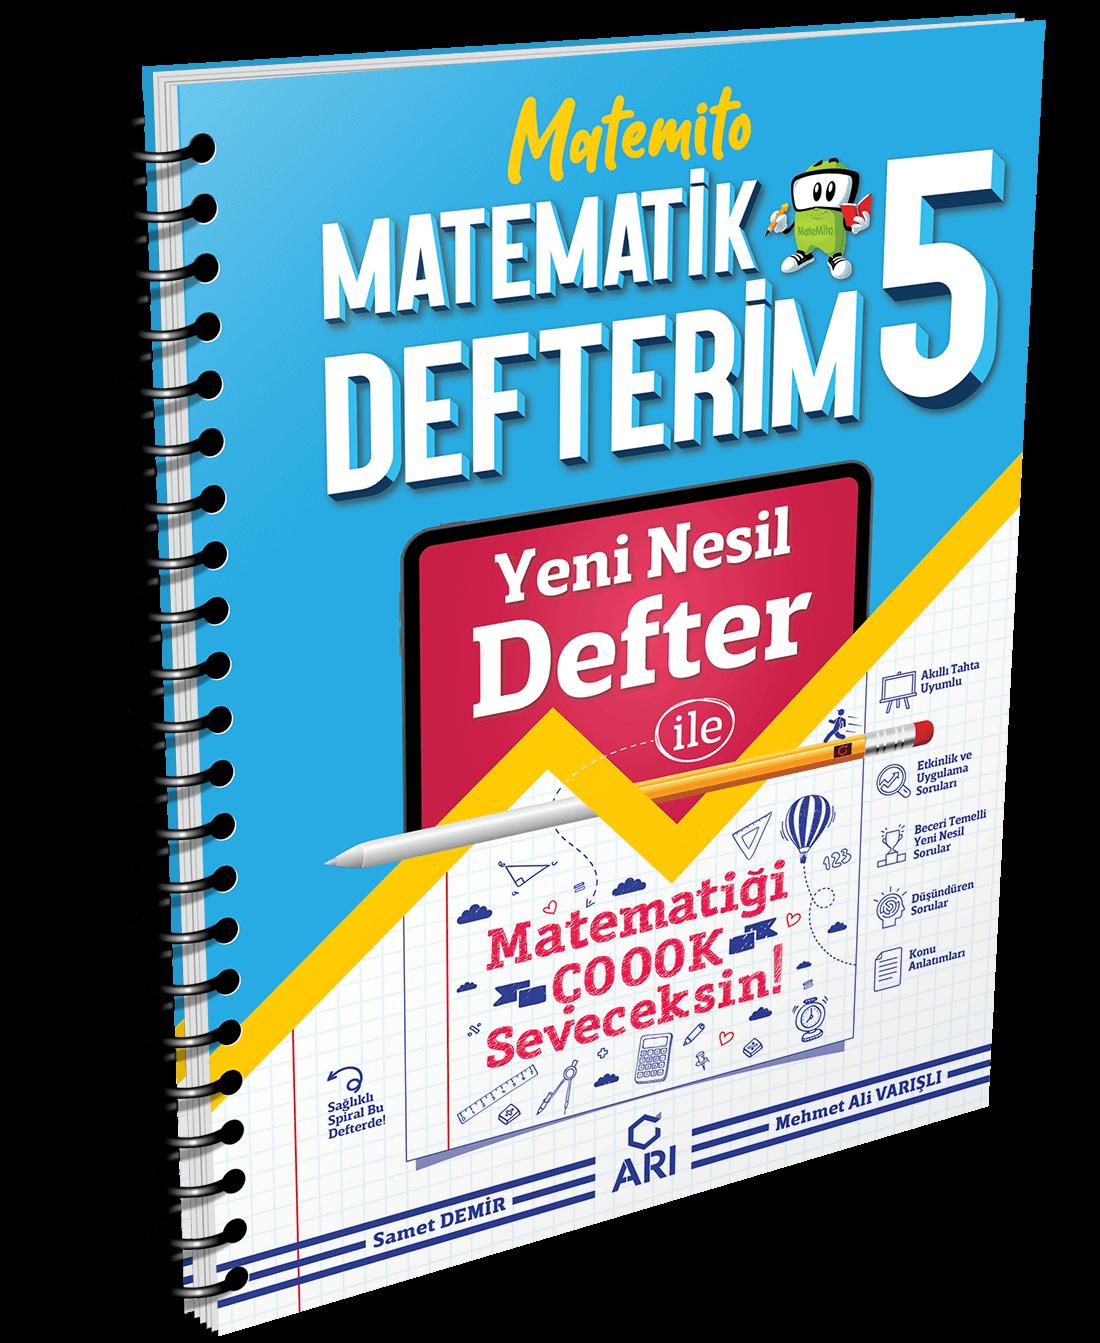 Matemito Matematik Defterim 5. Sınıf